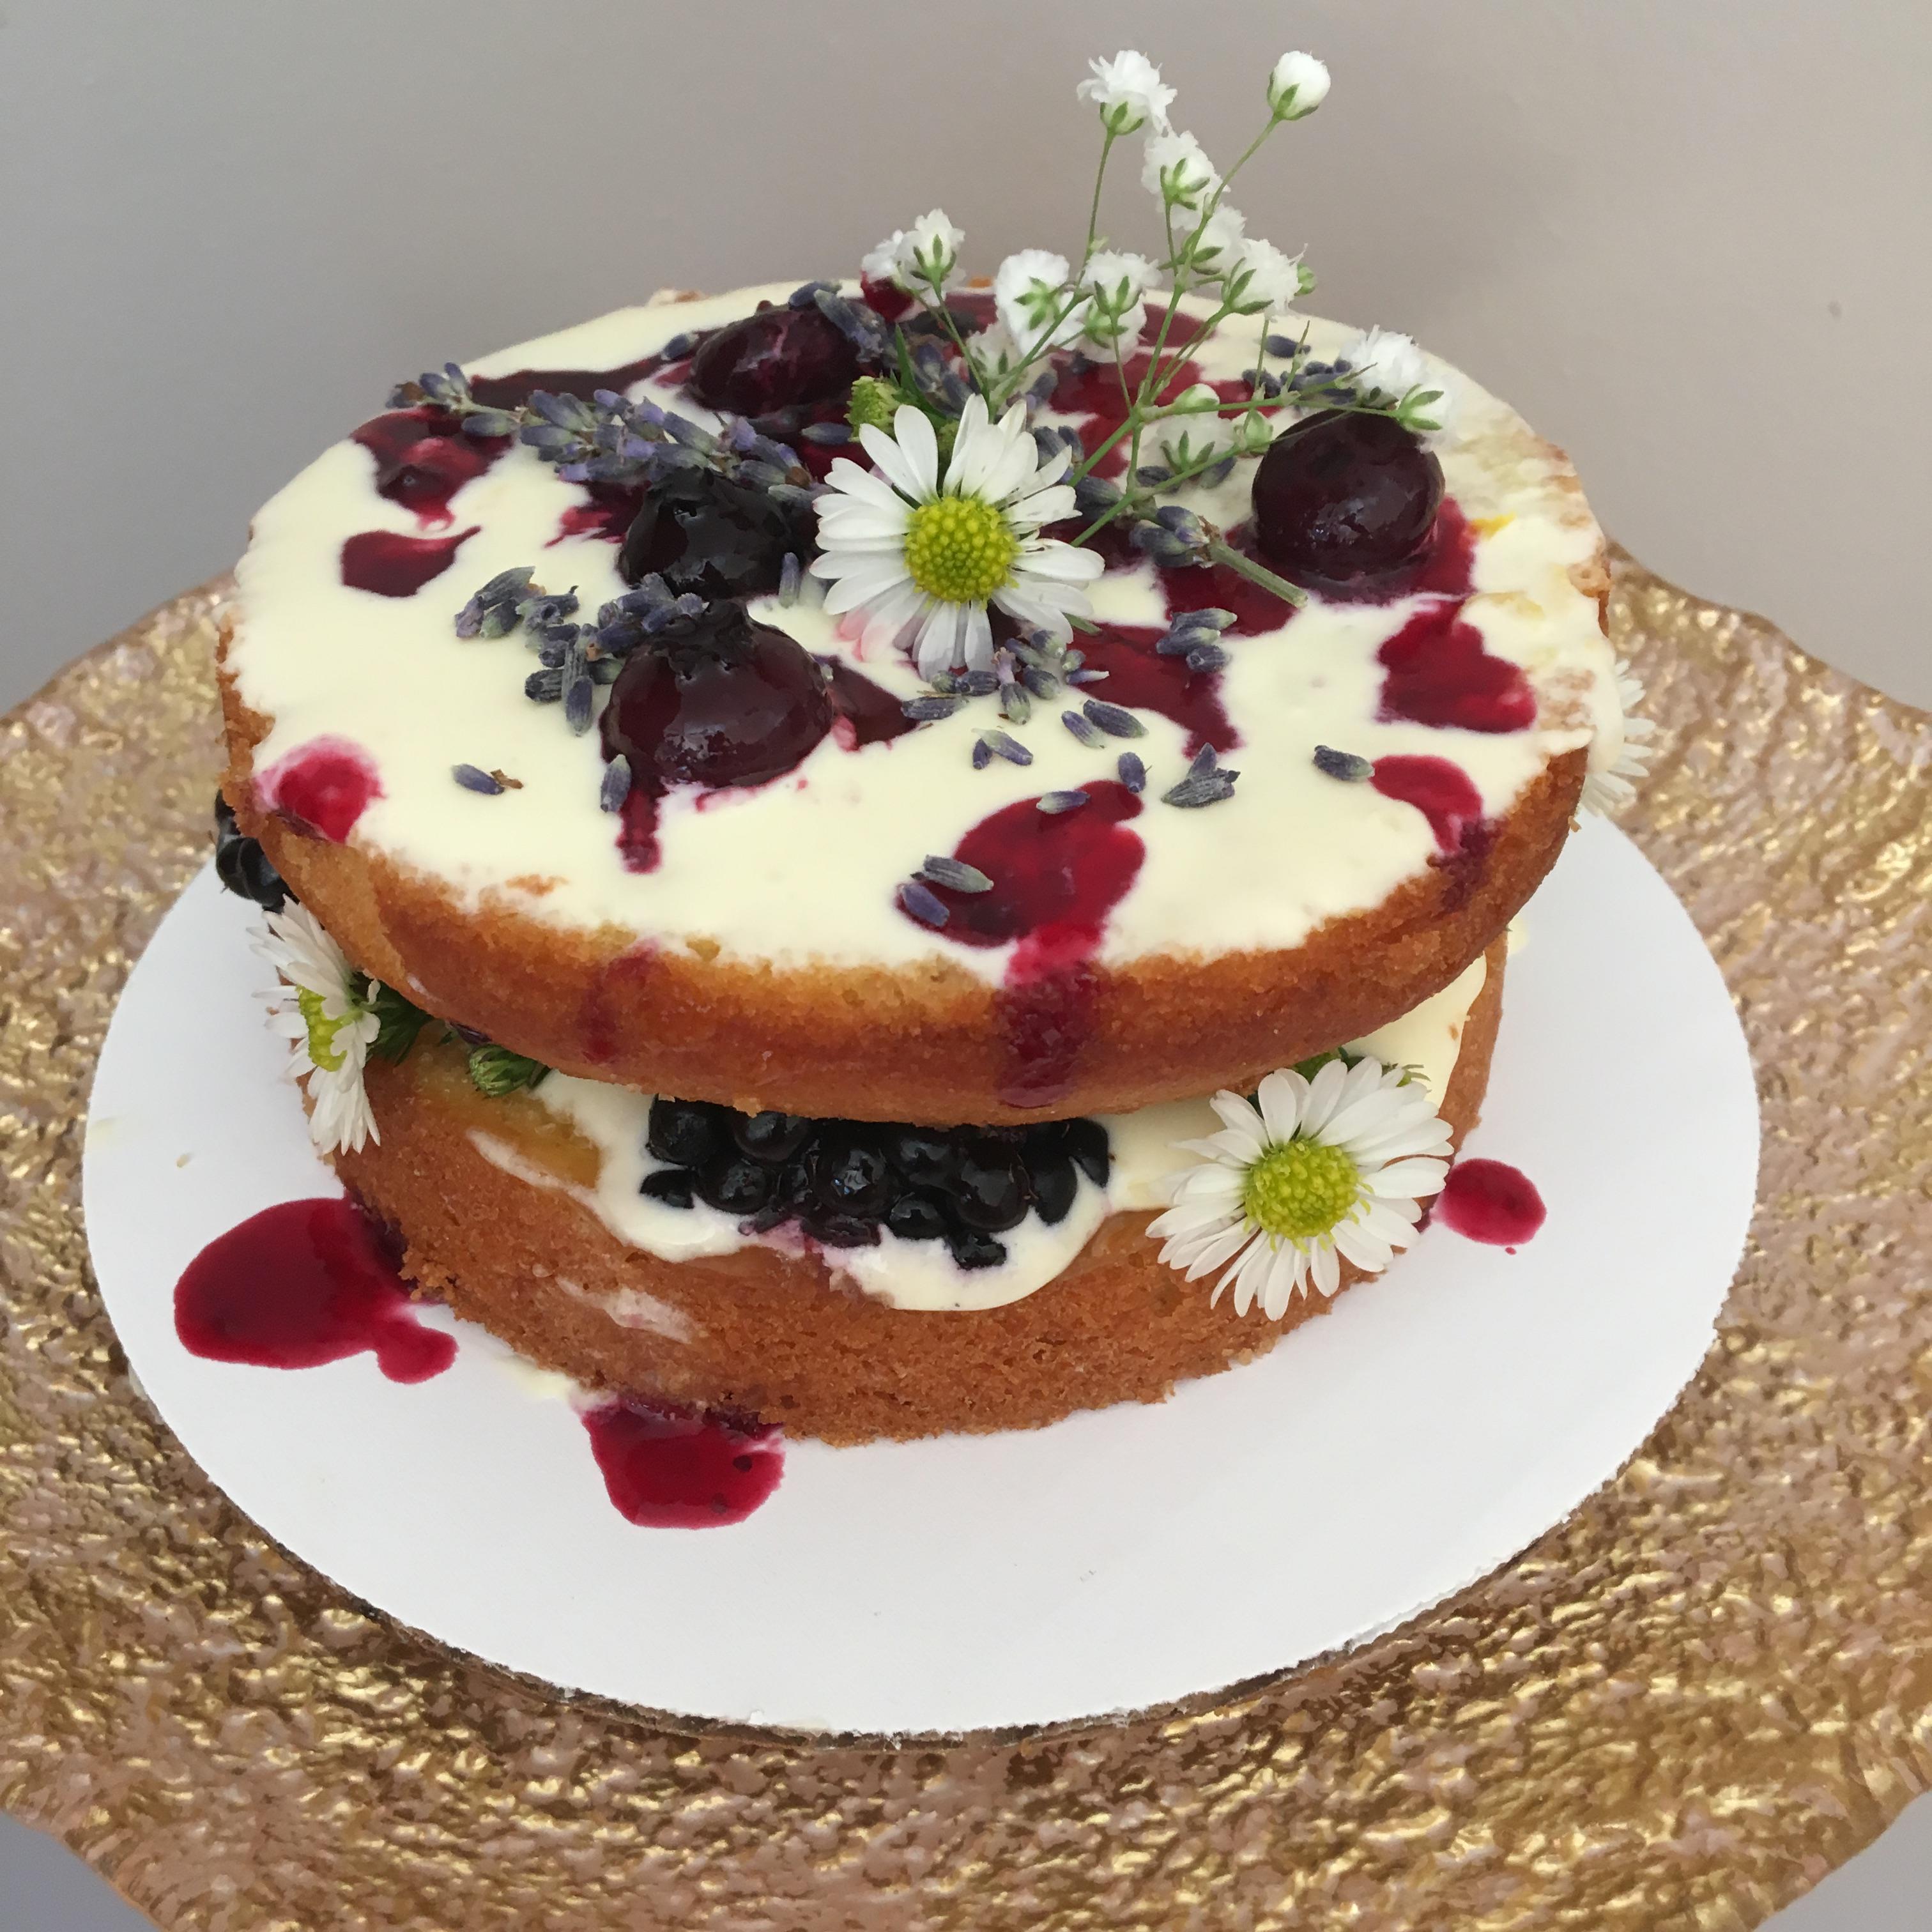 ILOO Cake